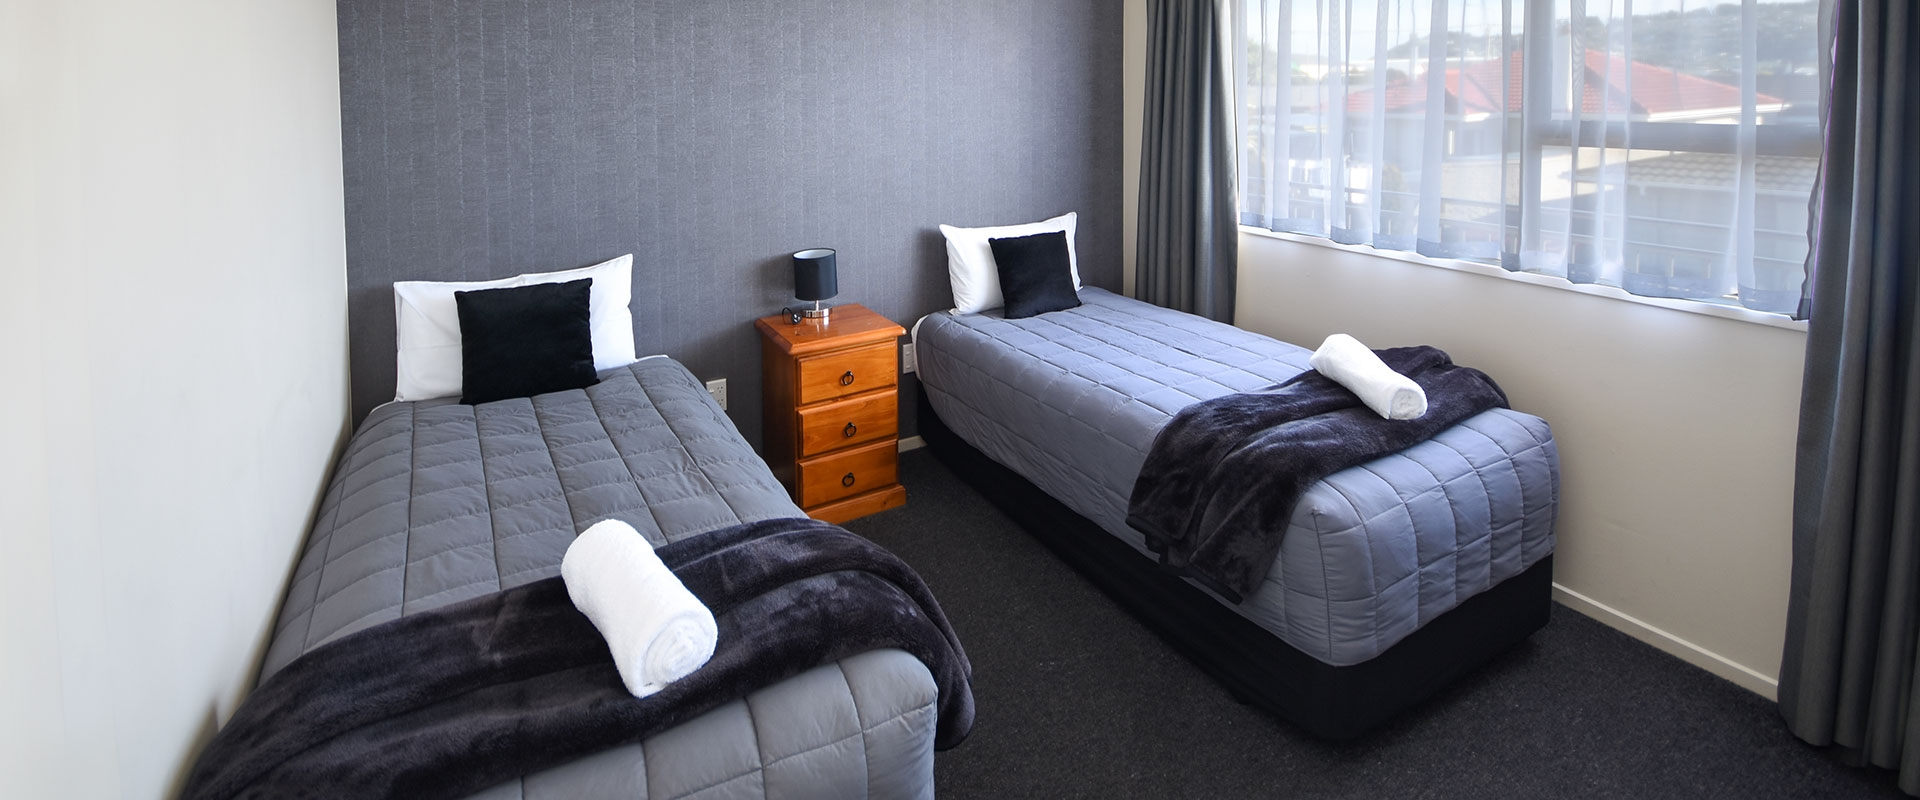 St Kilda motel